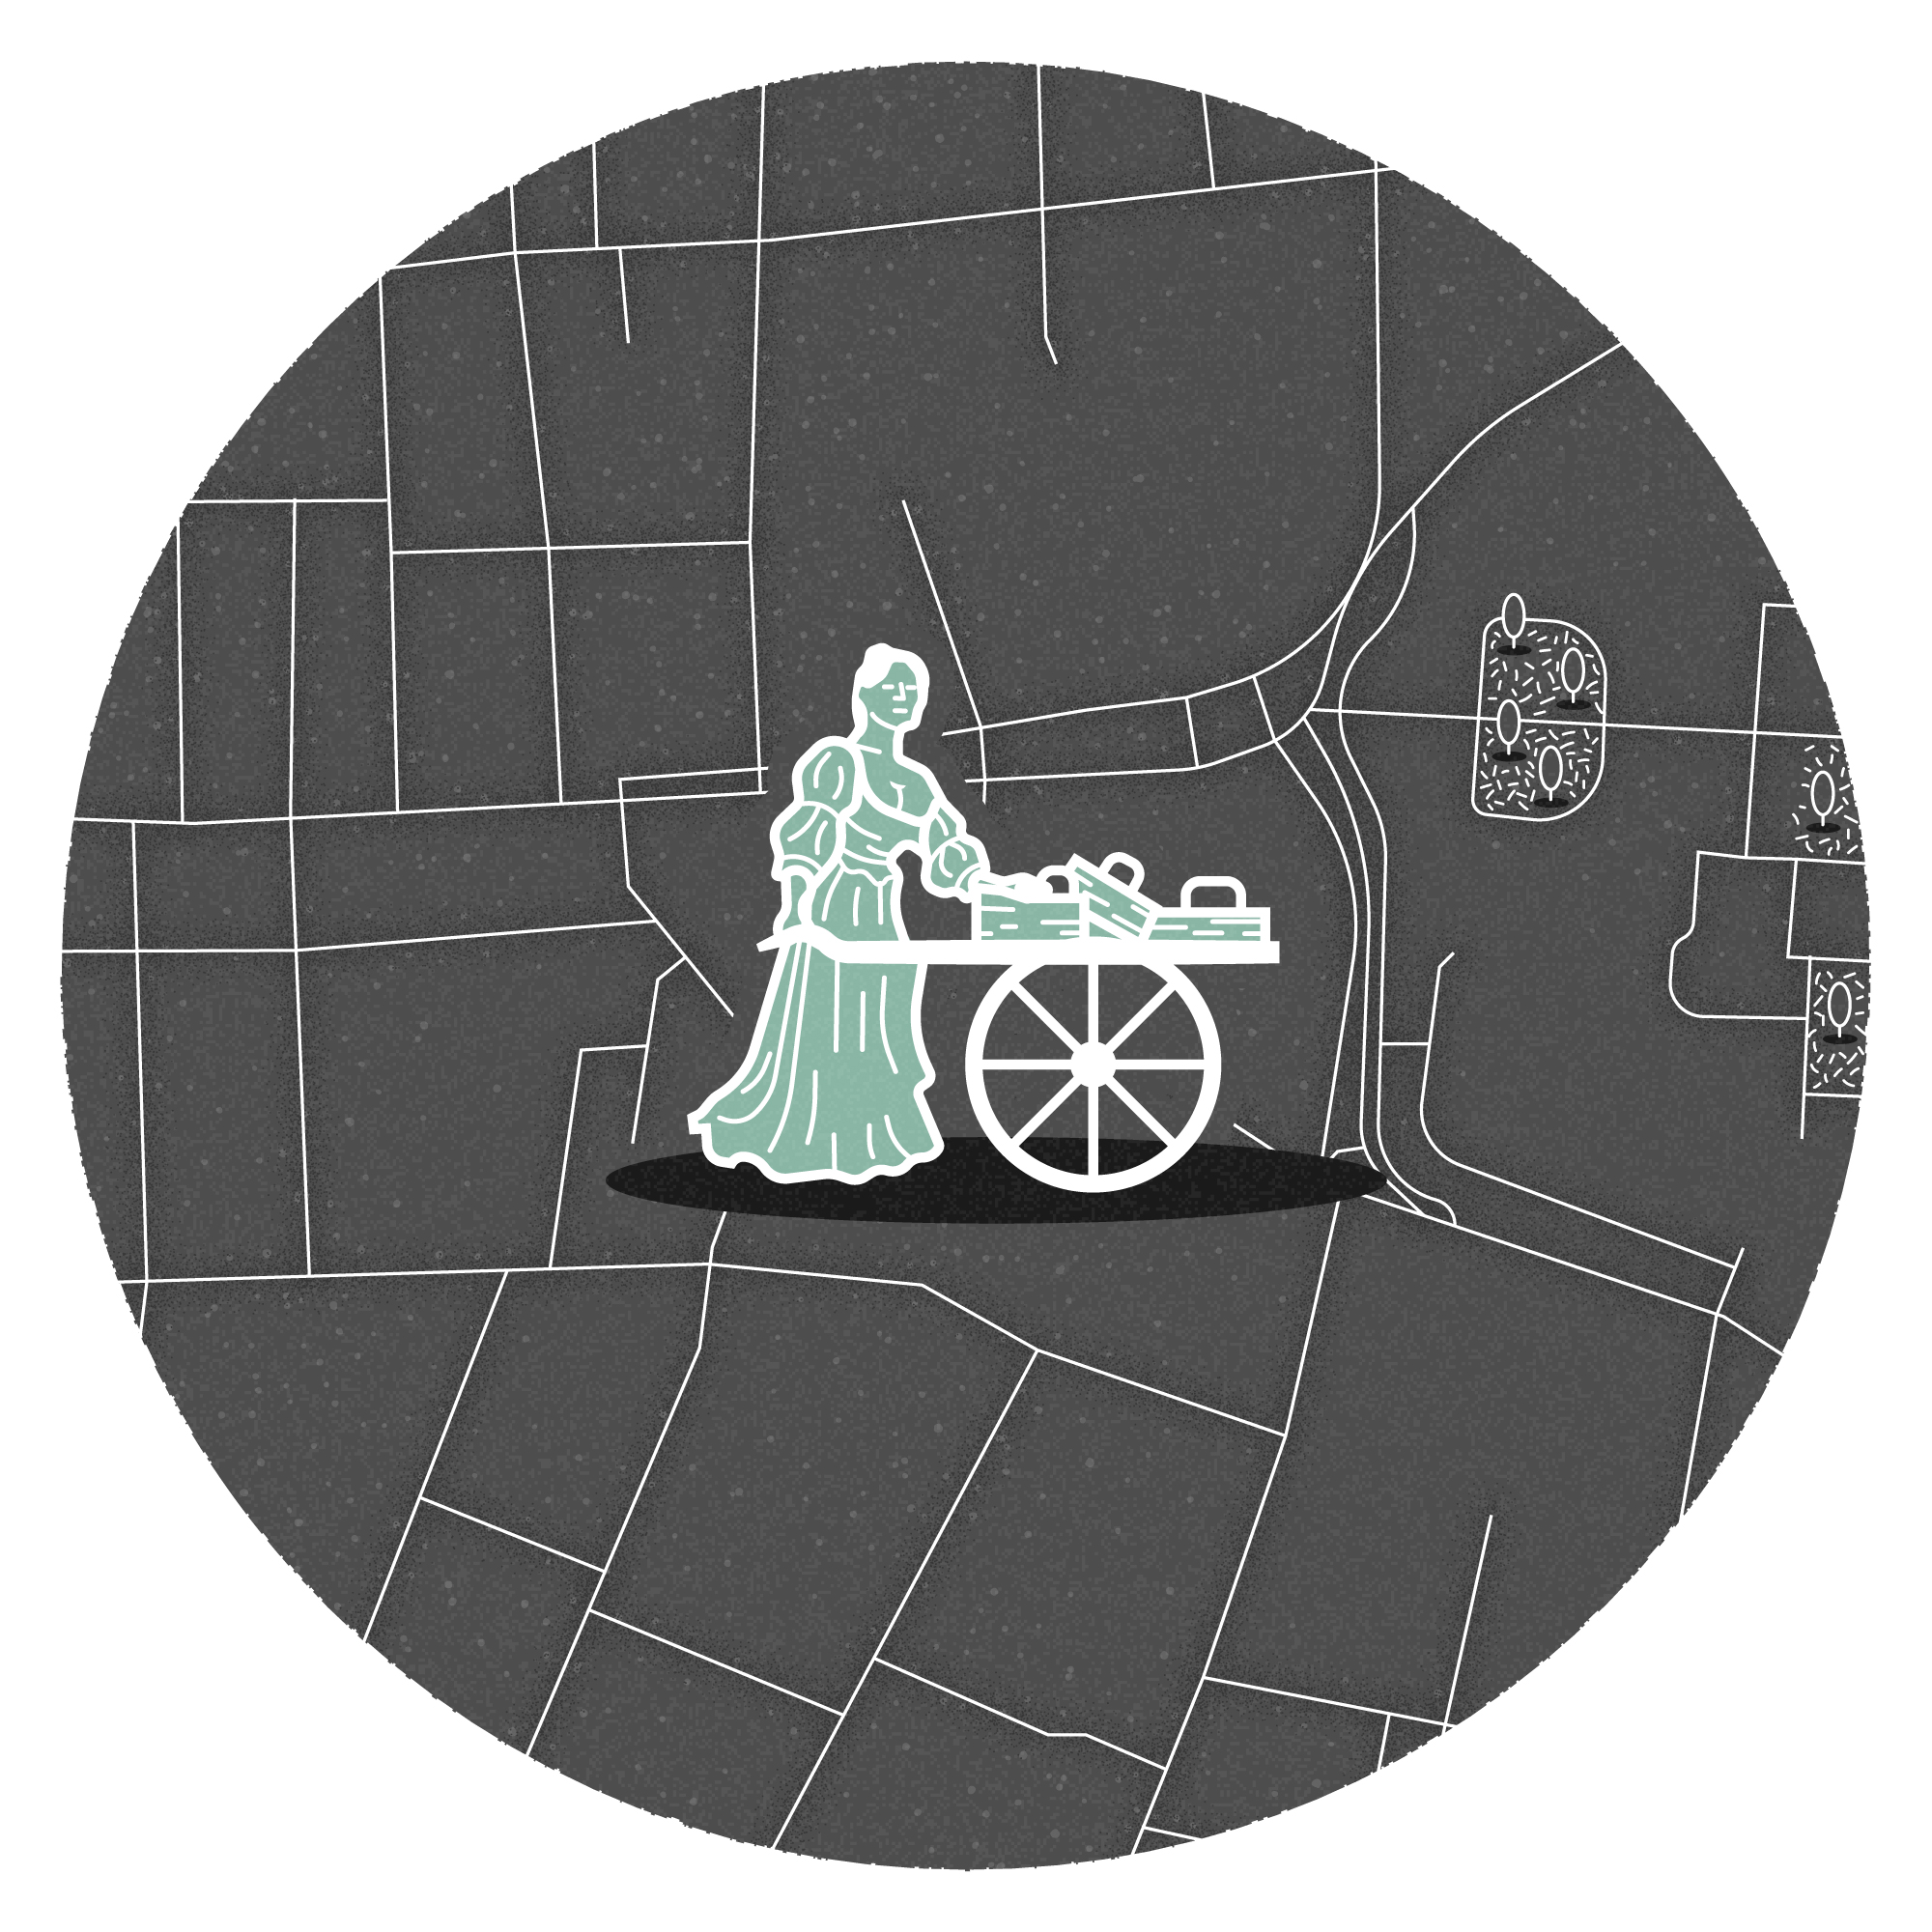 Mini illustrated map of Dublin